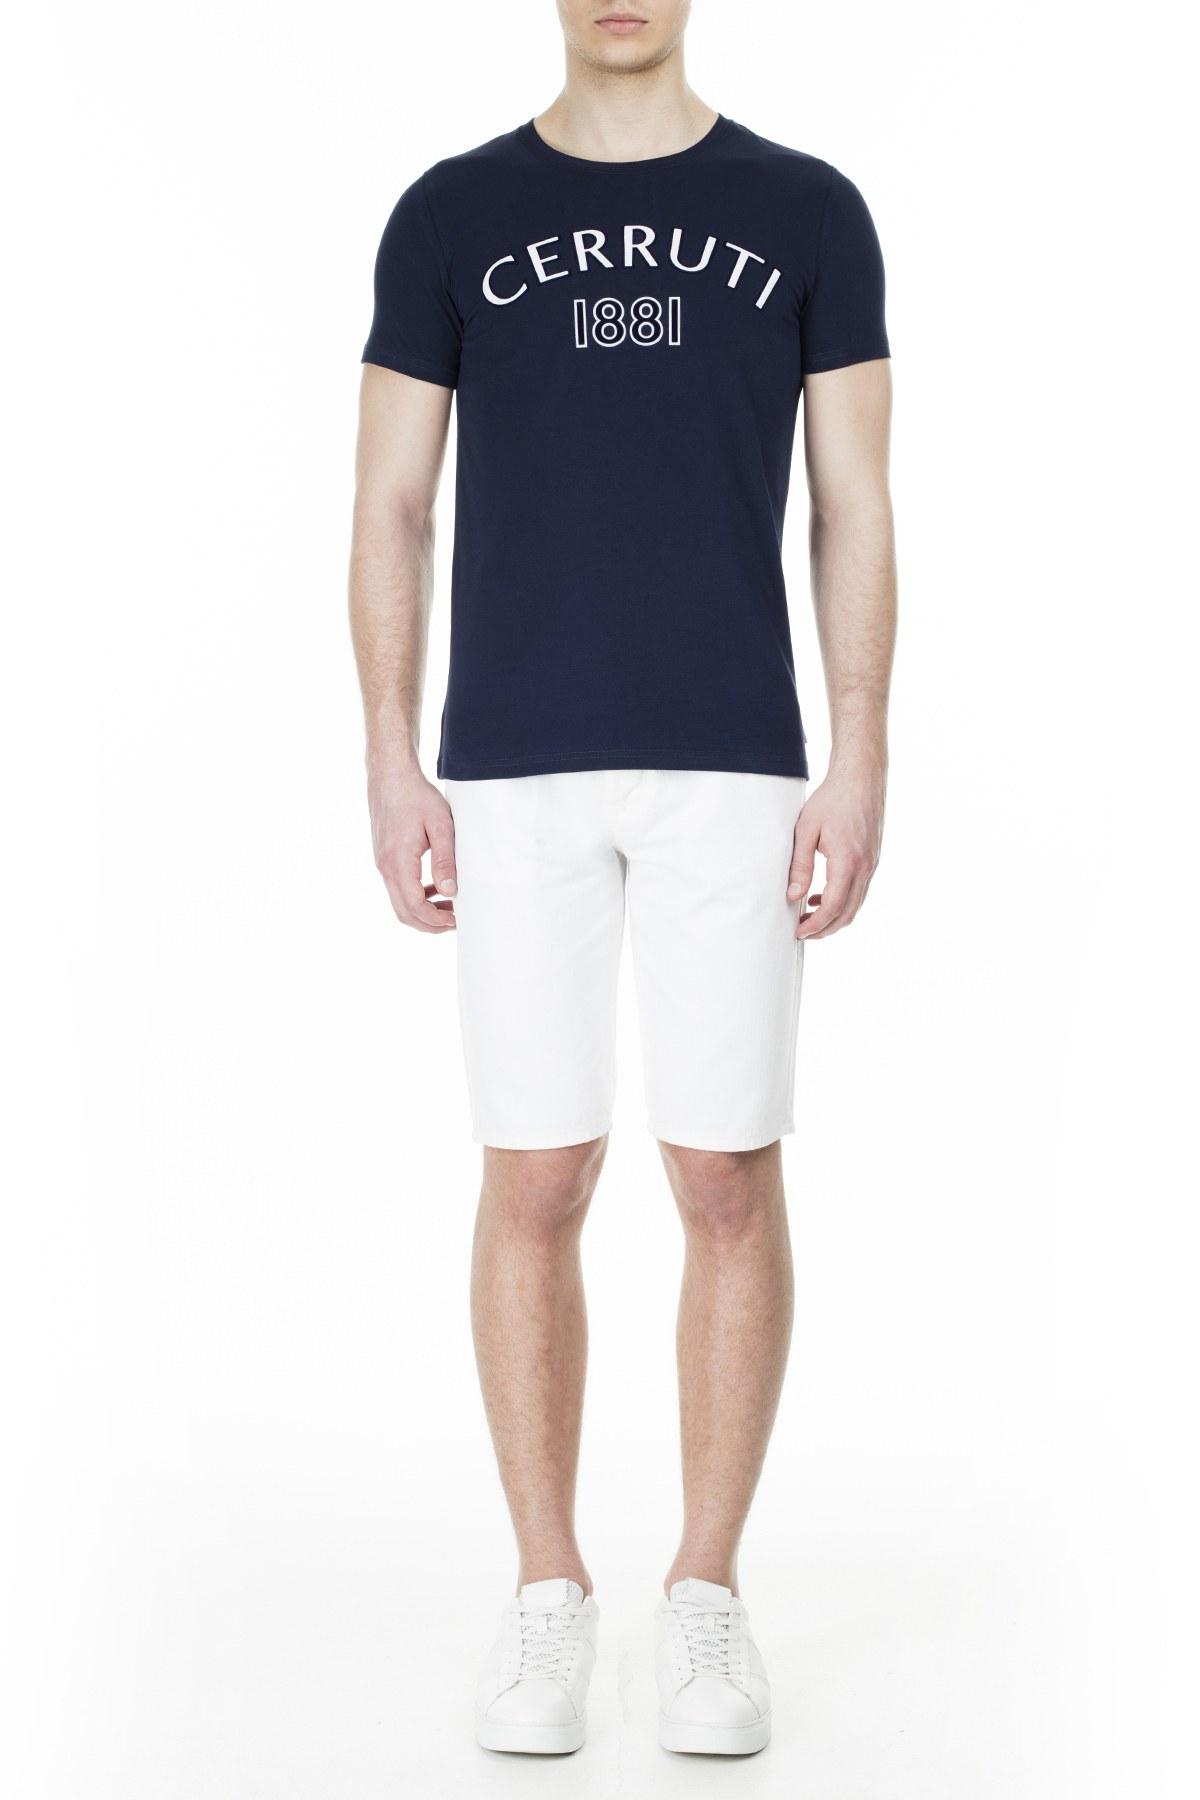 Cerruti 1881 Erkek T Shirt 203-001728 LACİVERT